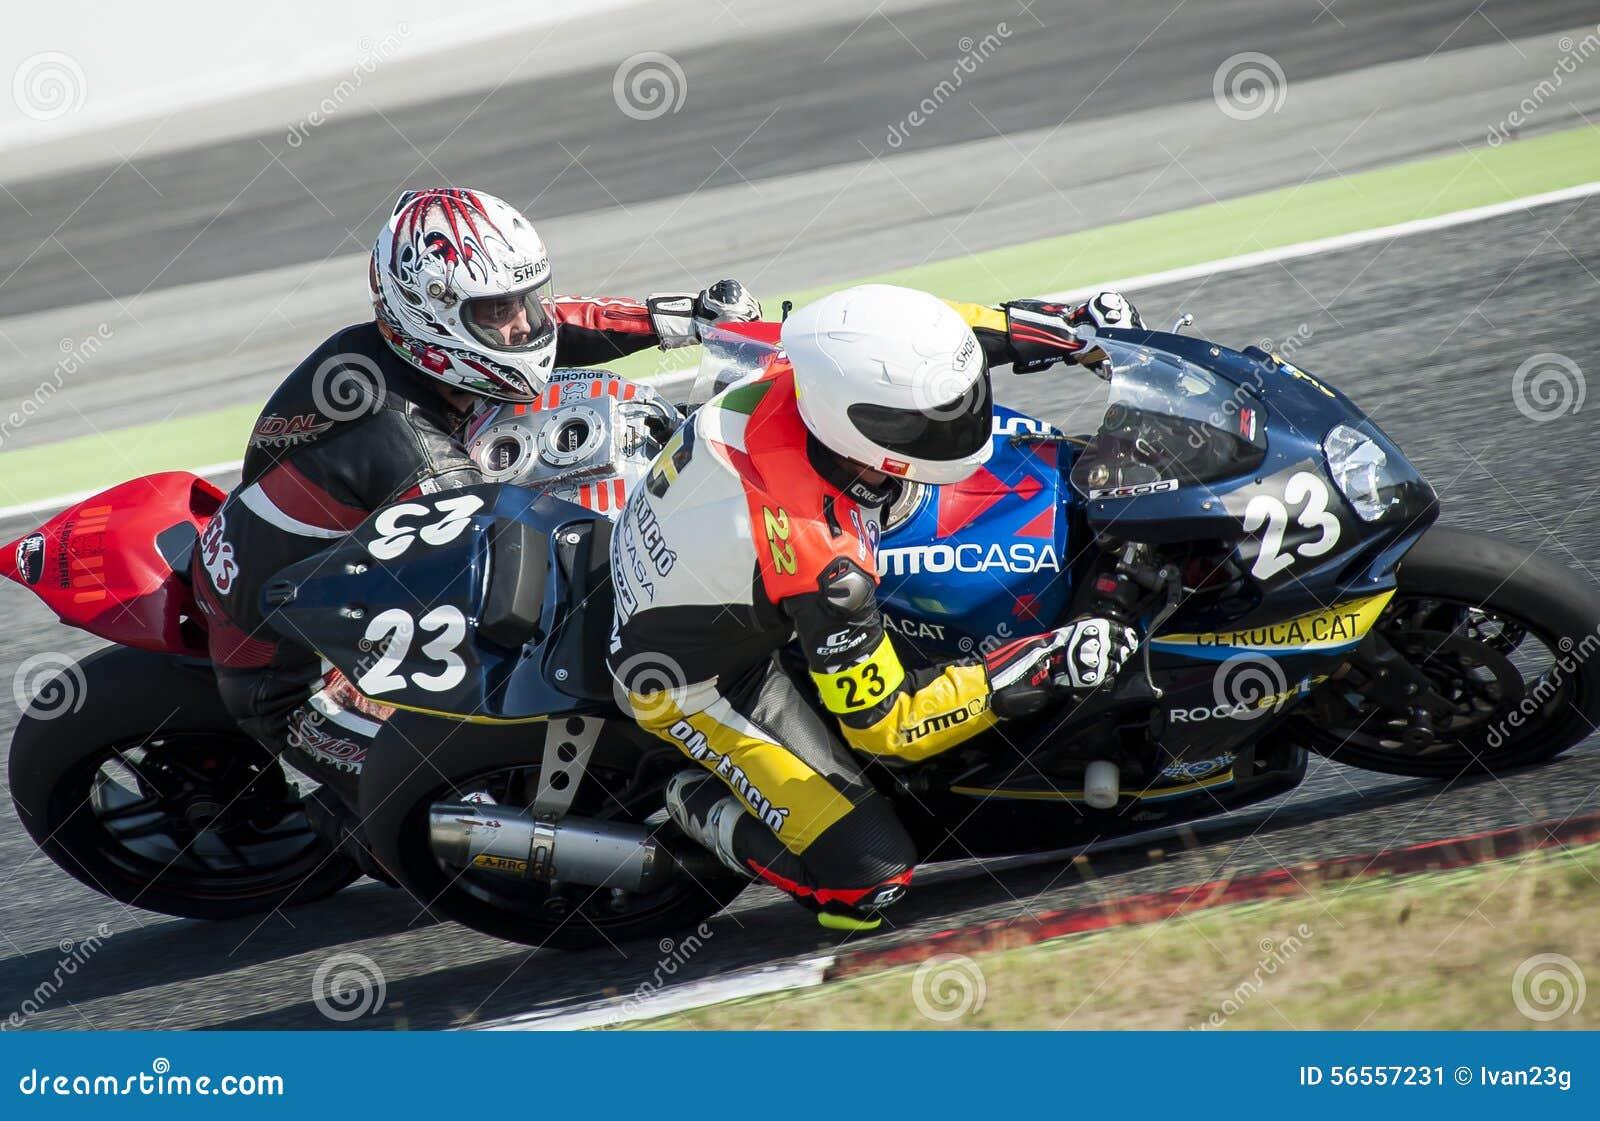 Download 24 ΑΝΤΟΧΗ ΩΡΩΝ MOTORCYCLING ΤΗΣ ΒΑΡΚΕΛΩΝΗΣ Εκδοτική Εικόνες - εικόνα από ανταγωνισμός, νίκη: 56557231